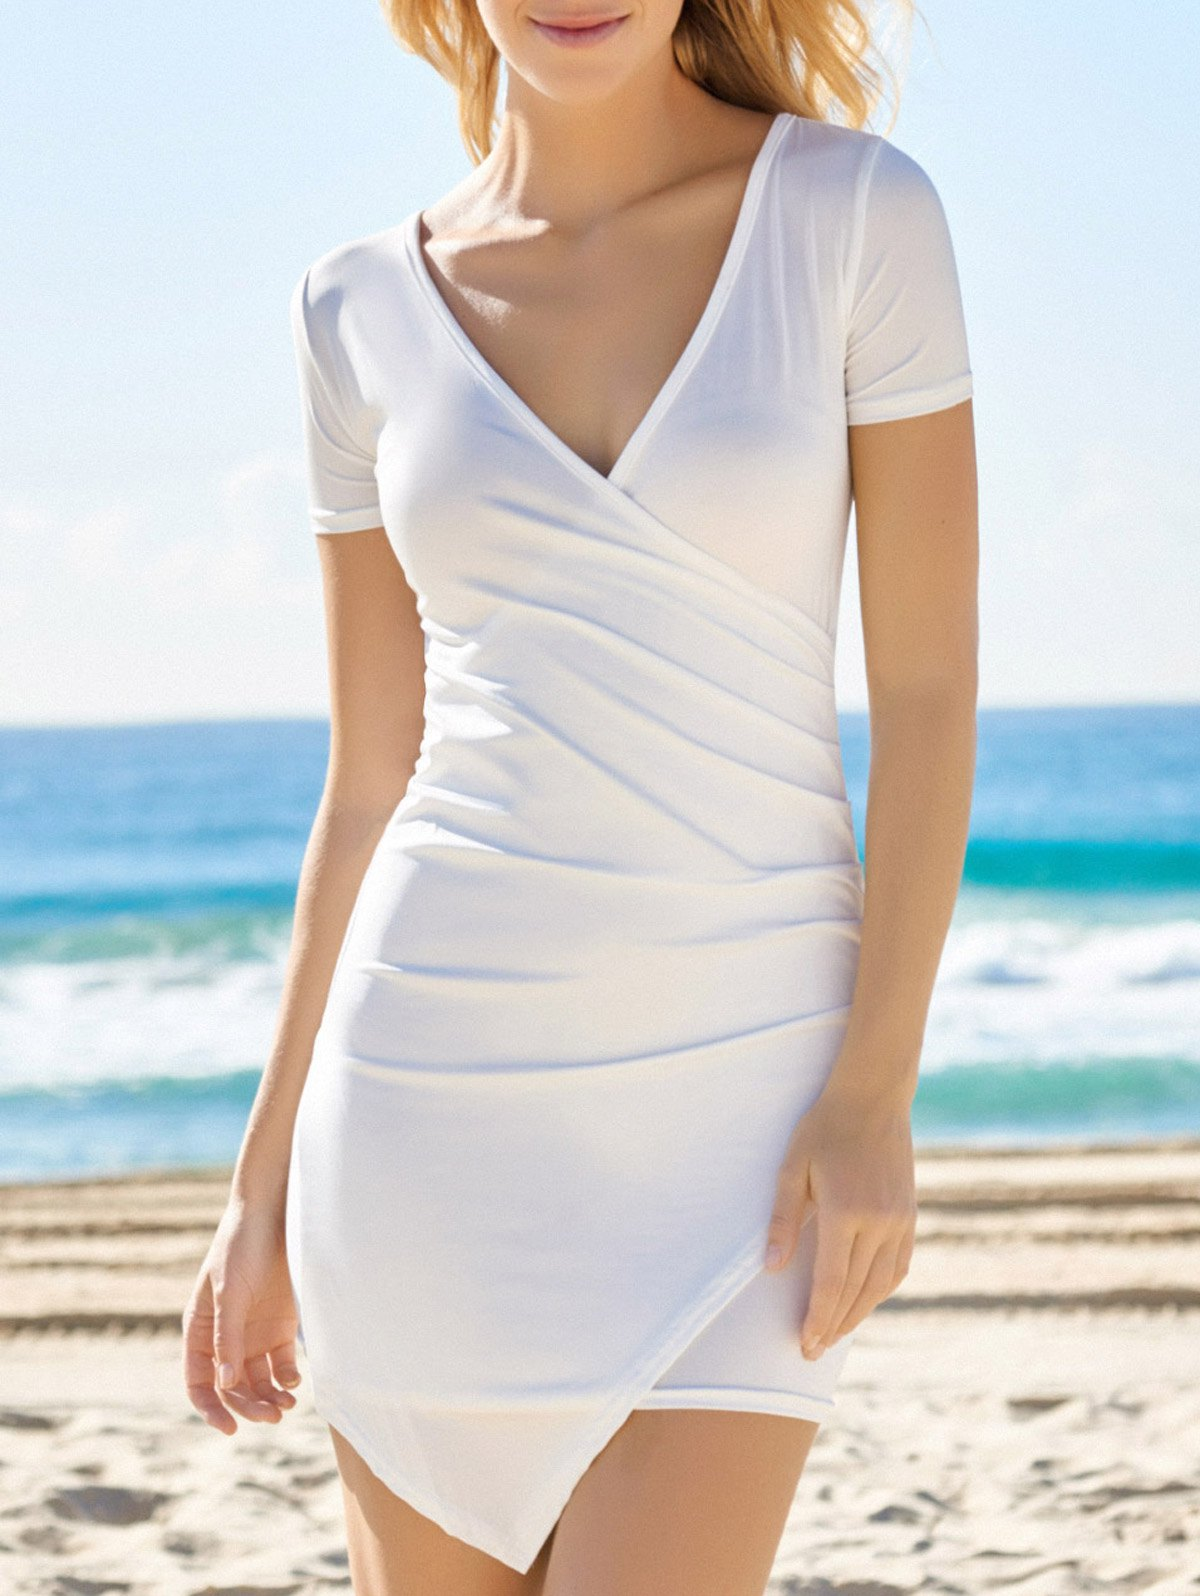 Solid Color Plunging Neck Bodycon DressClothes<br><br><br>Size: L<br>Color: WHITE